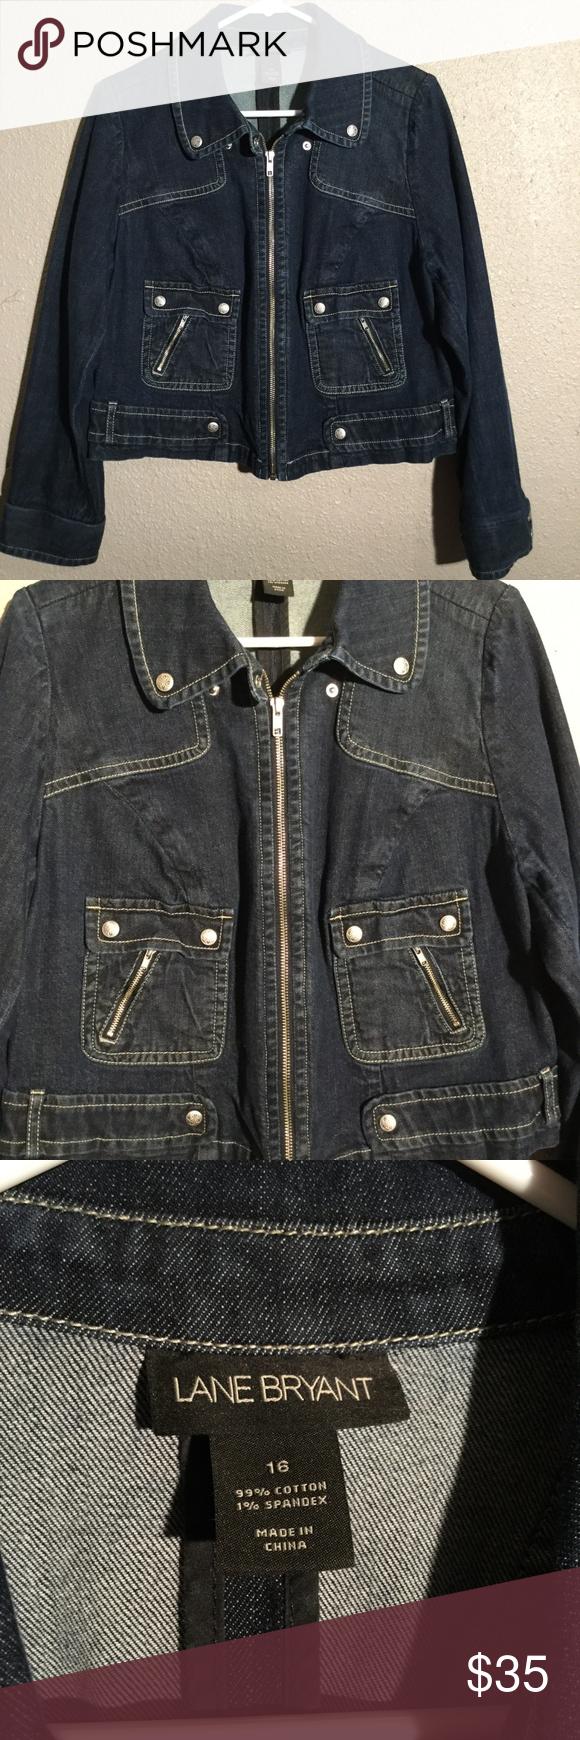 c870bdaf4b619 Lane Bryant Women Crop Denim Jacket Plus size 16 EUC Denim Jacket by Lane  Bryant. Women s Plus size 16. This jacket is a shorter crop length.